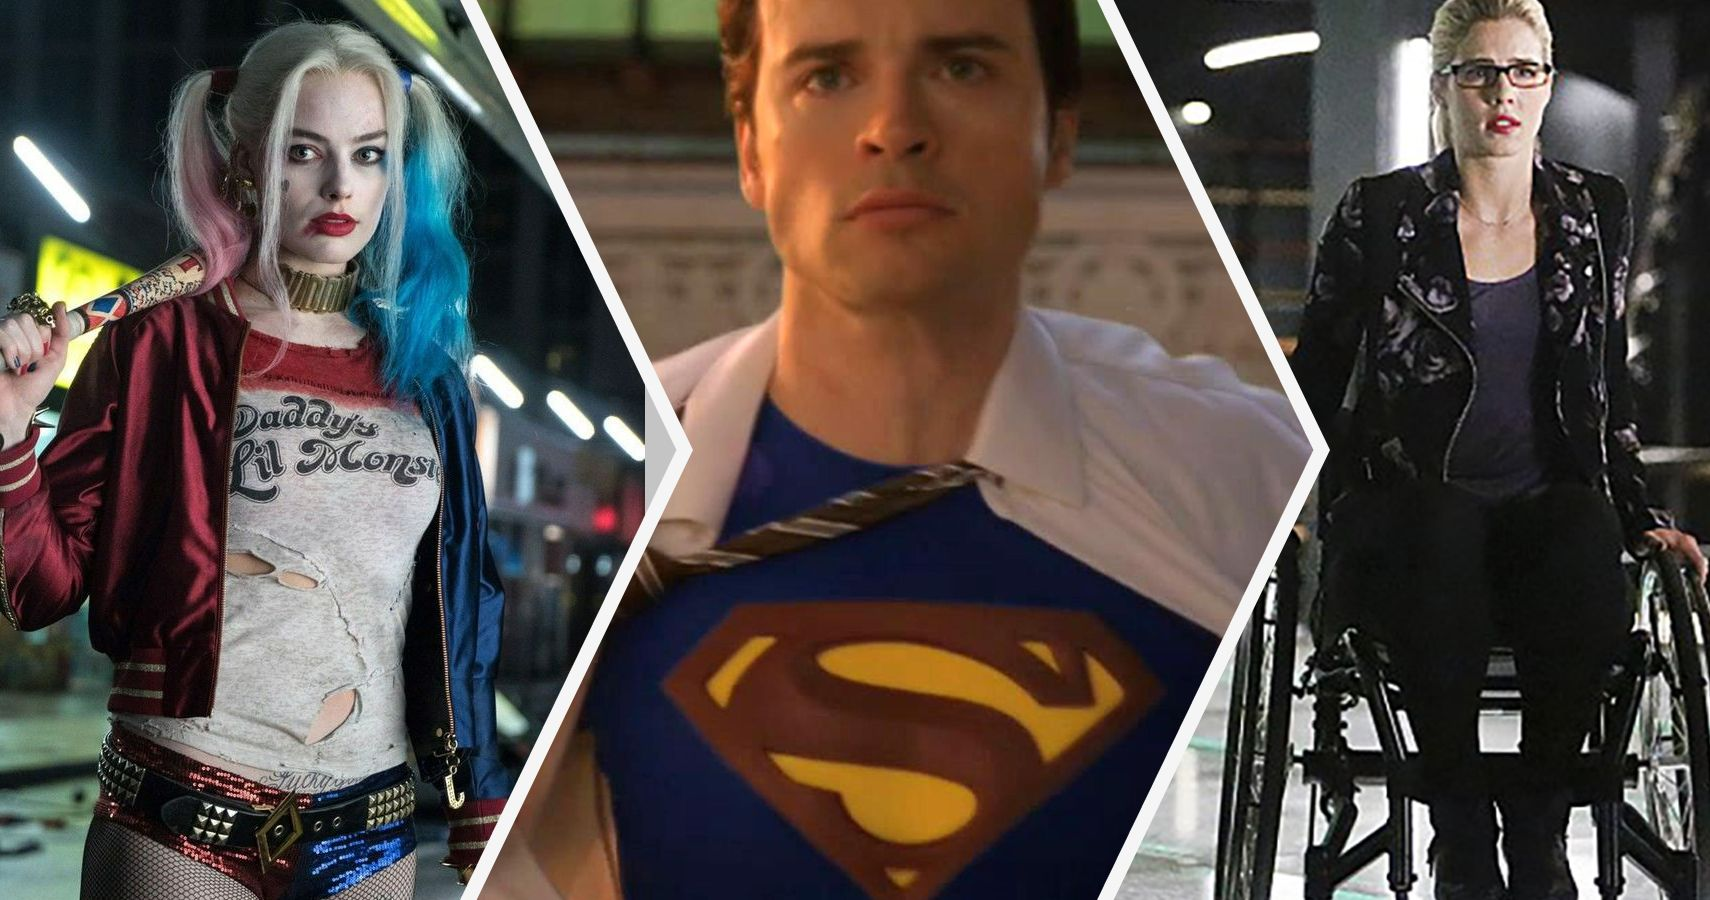 Elseworlds DC Fandom in 2019 Flash arrow Flash crossover